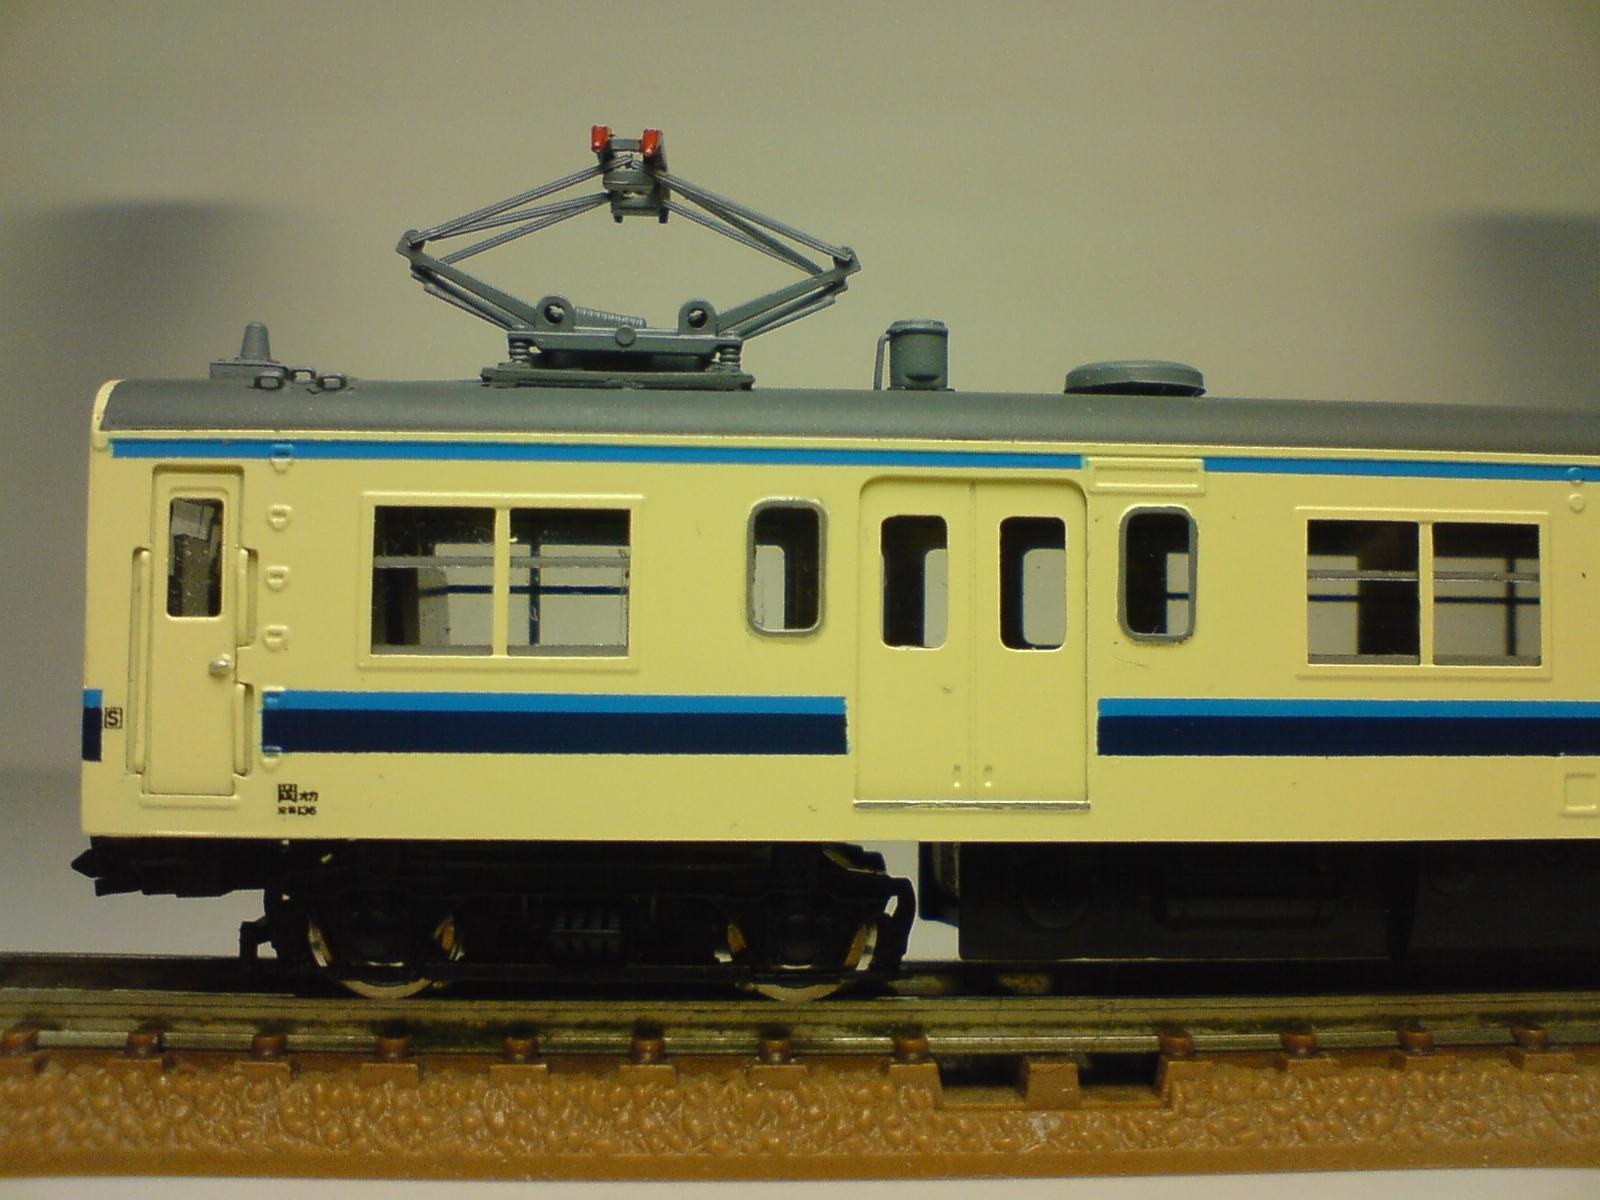 Kc380013